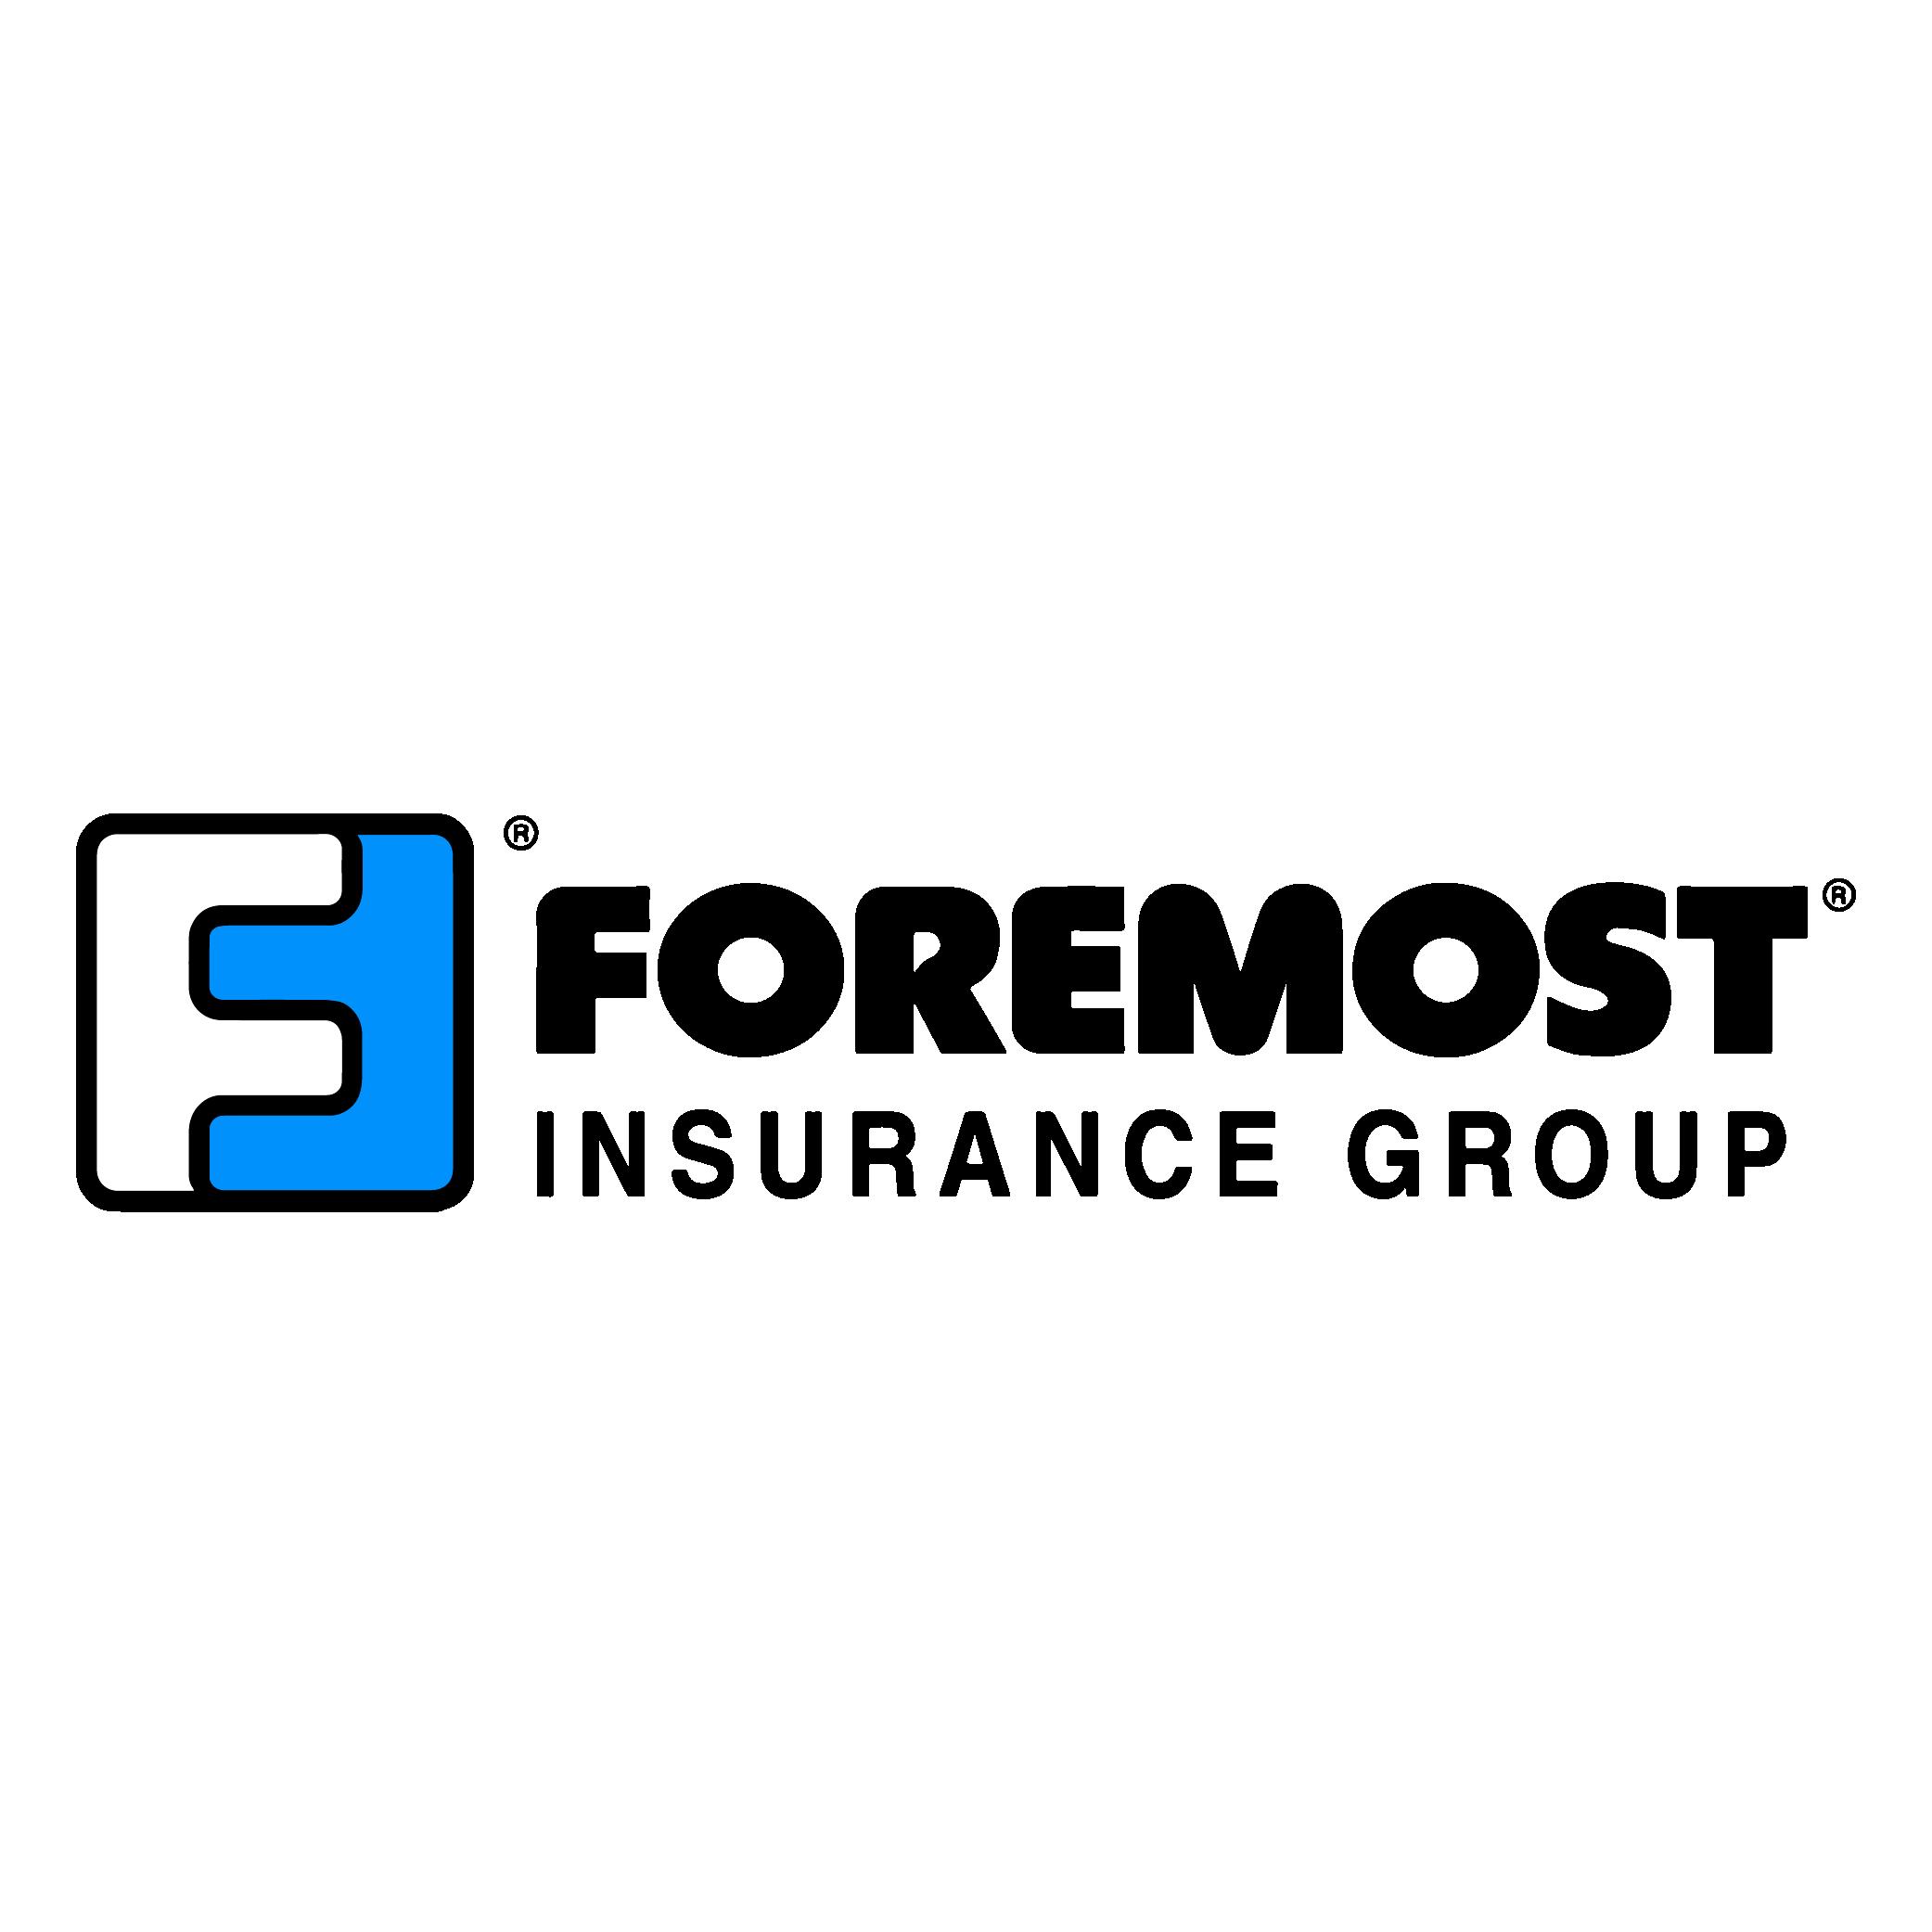 GAD Insurance Carrier Logos-15.png